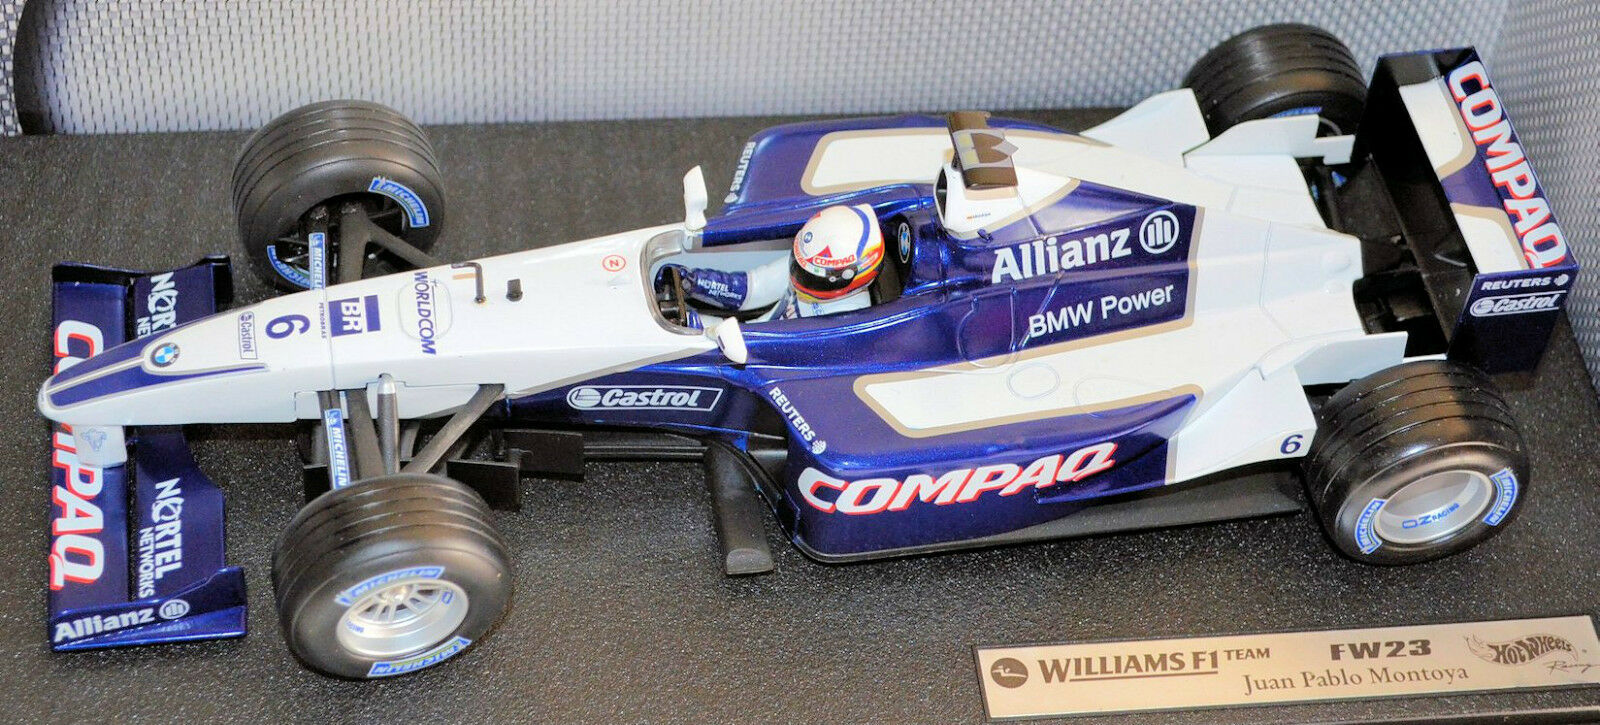 Williams fw 23 bmw 2001 j.p. montoya compaq alianza 1 18 Hot Wheels